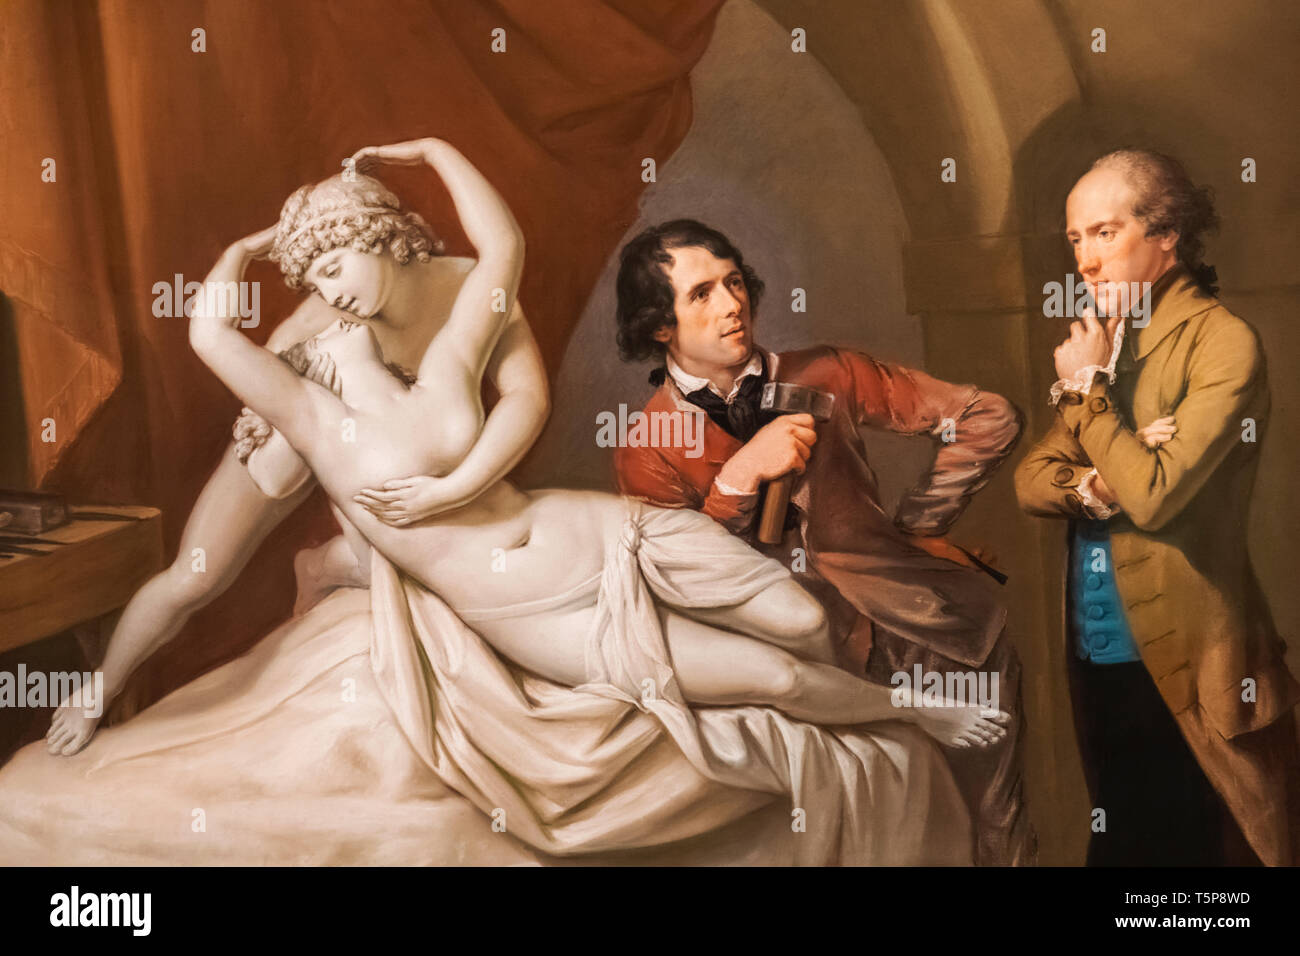 Painting of The Italian Sculptor Antonio Canova in His Studio by Hugh Douglas Hamilton dated 1790 - Stock Image